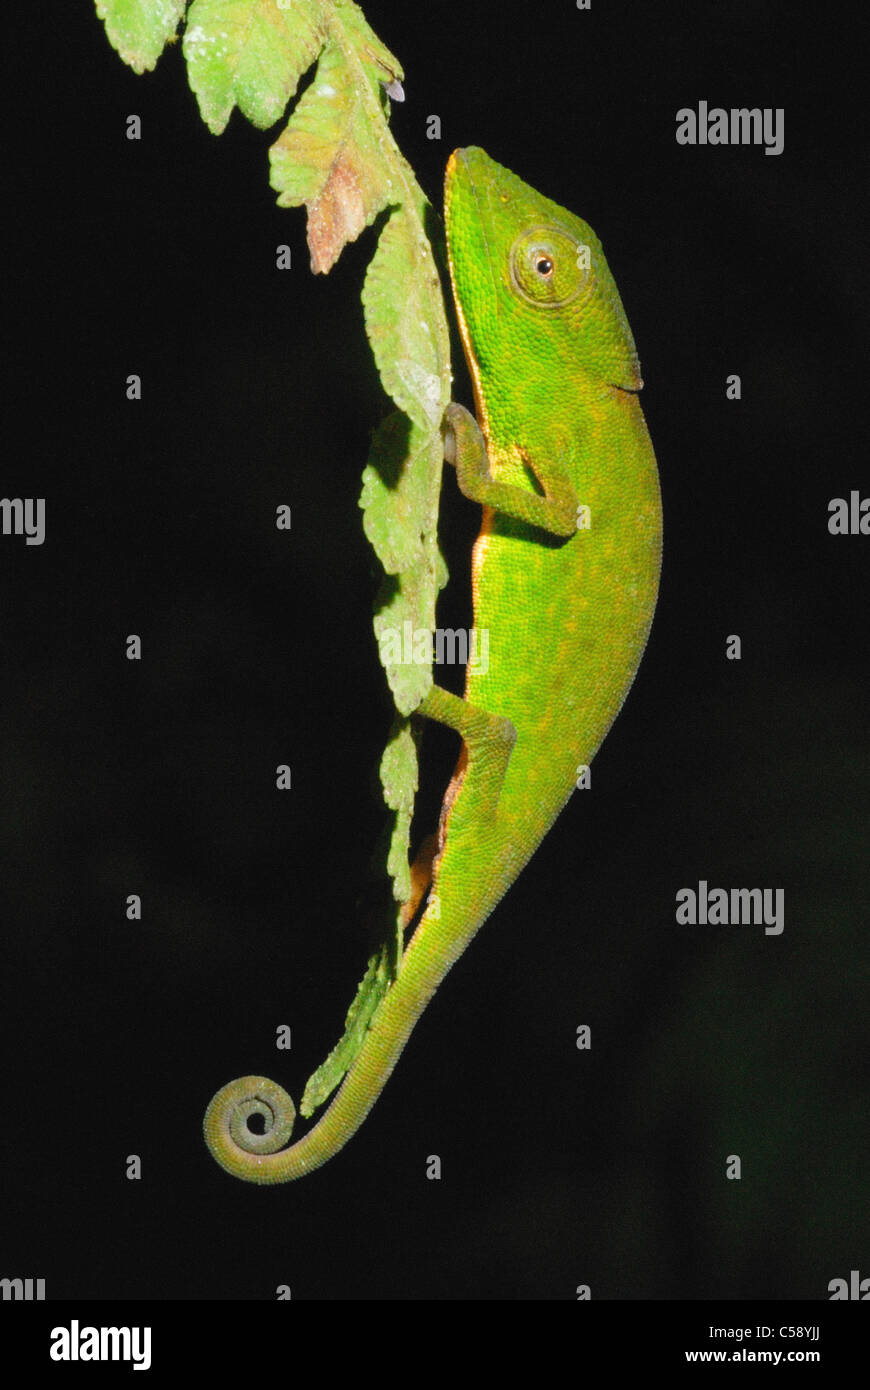 Glaw's Chameleon (Calumma glawi) in Ranomafana National Park - Stock Image